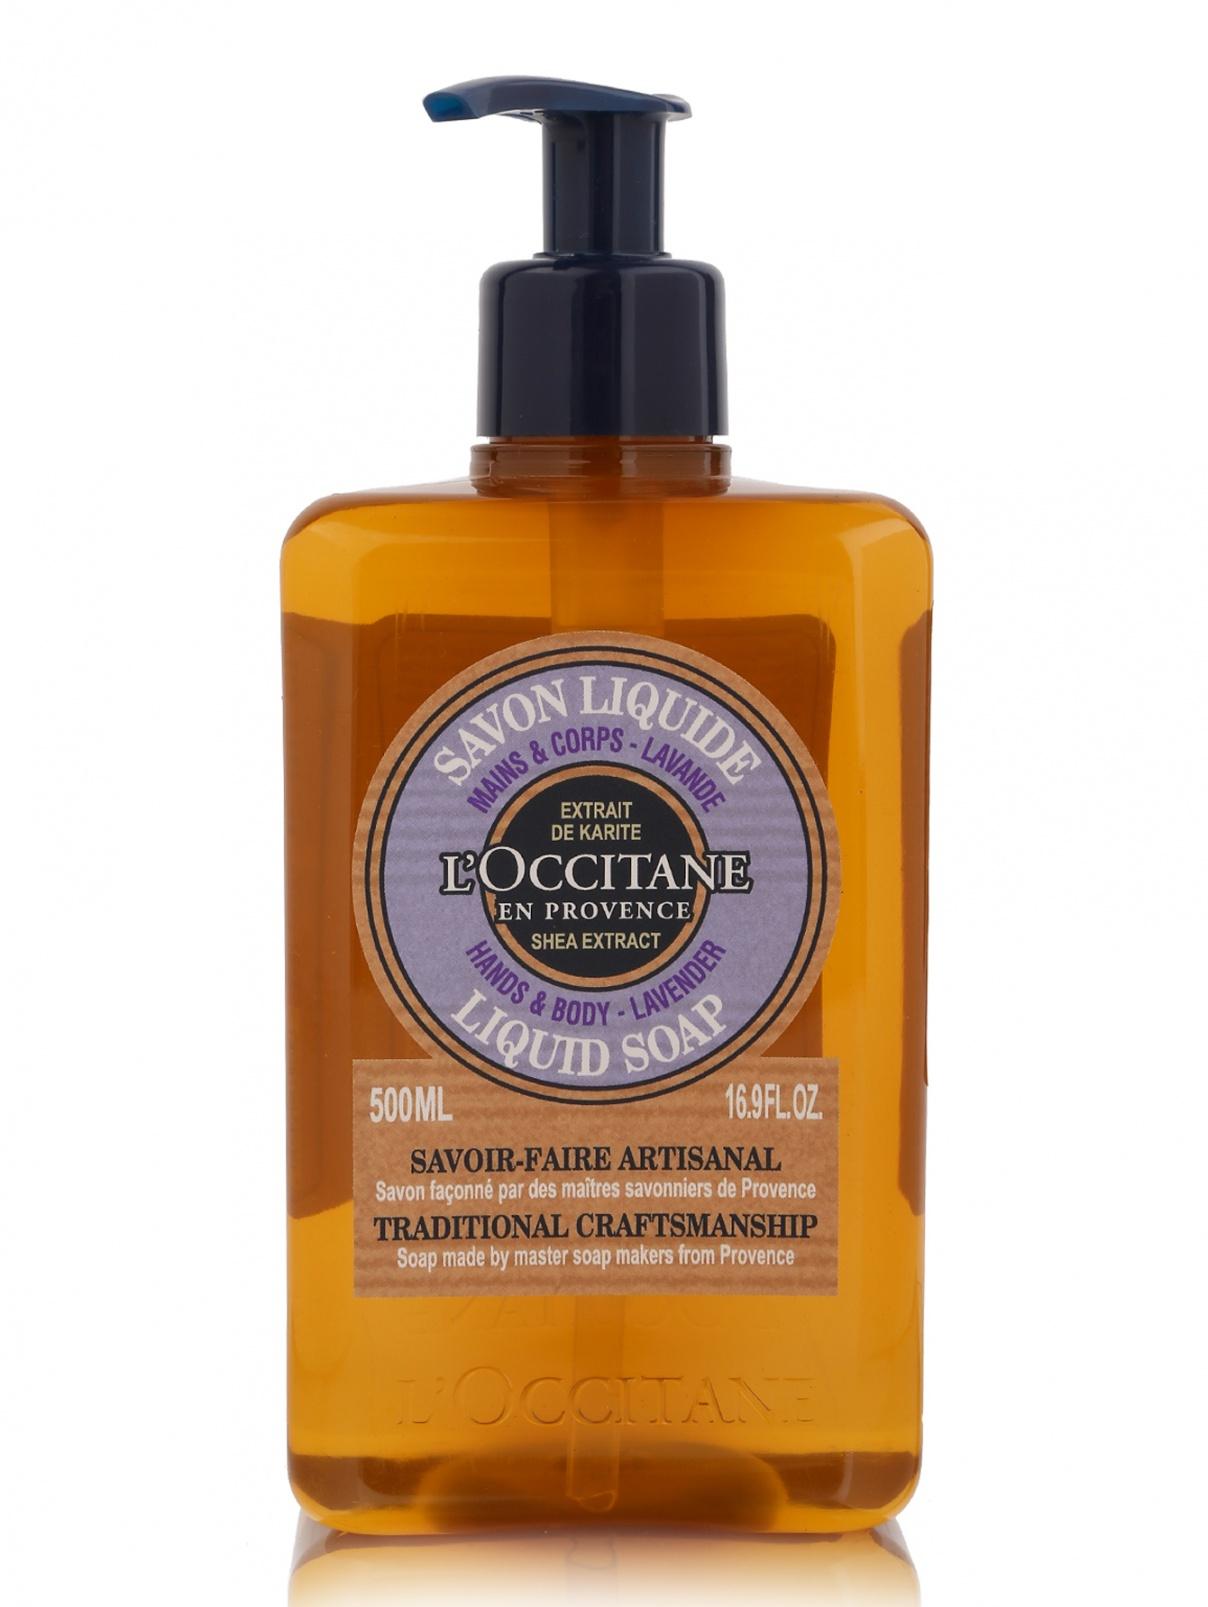 Жидкое мыло Лаванда-Карите 500 мл L'Occitane  –  Общий вид